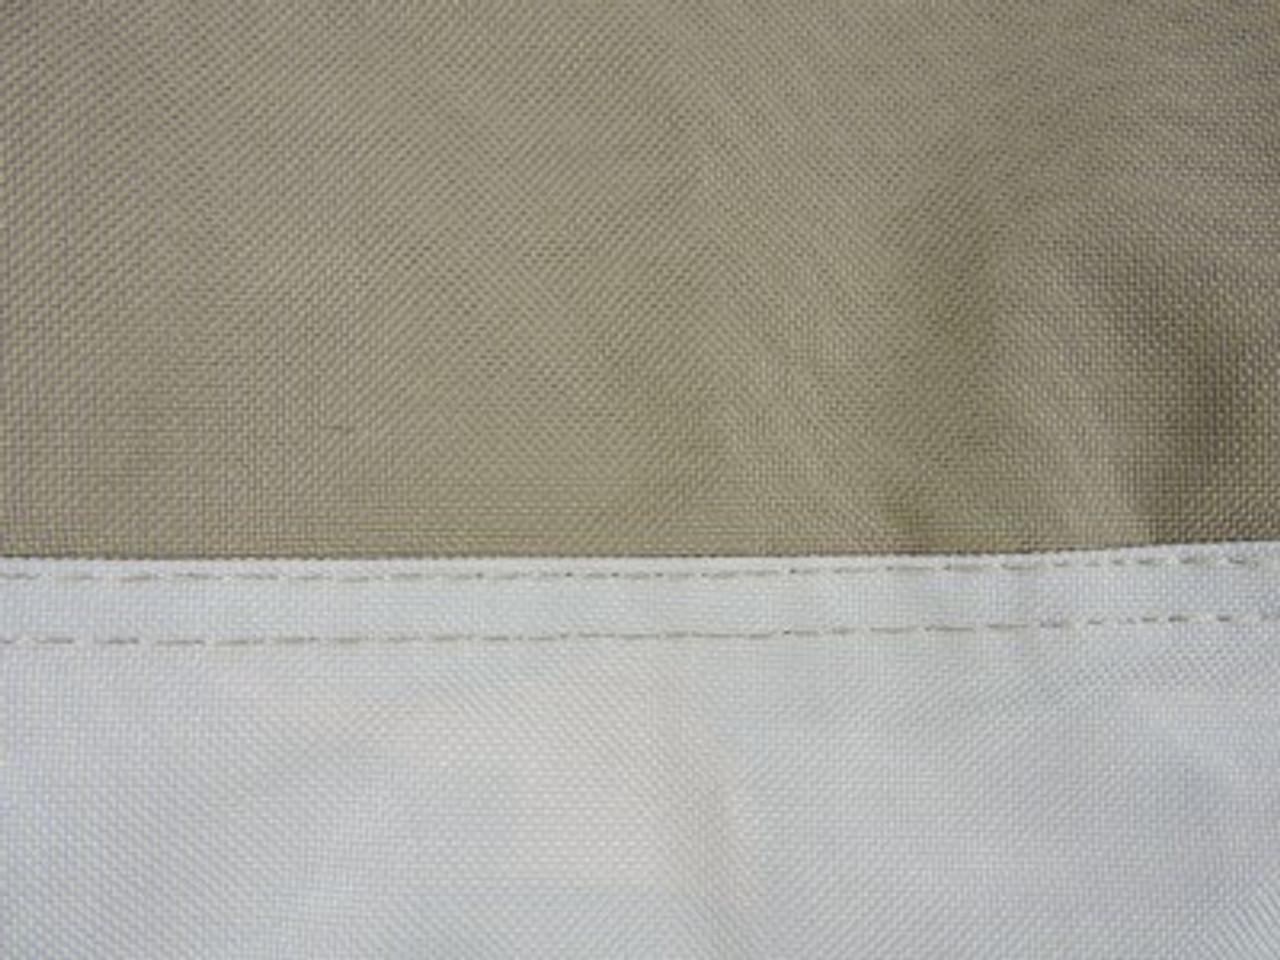 Magic Box Sofa Cover (80Wx40Dx17H)  (Savanna #512110)